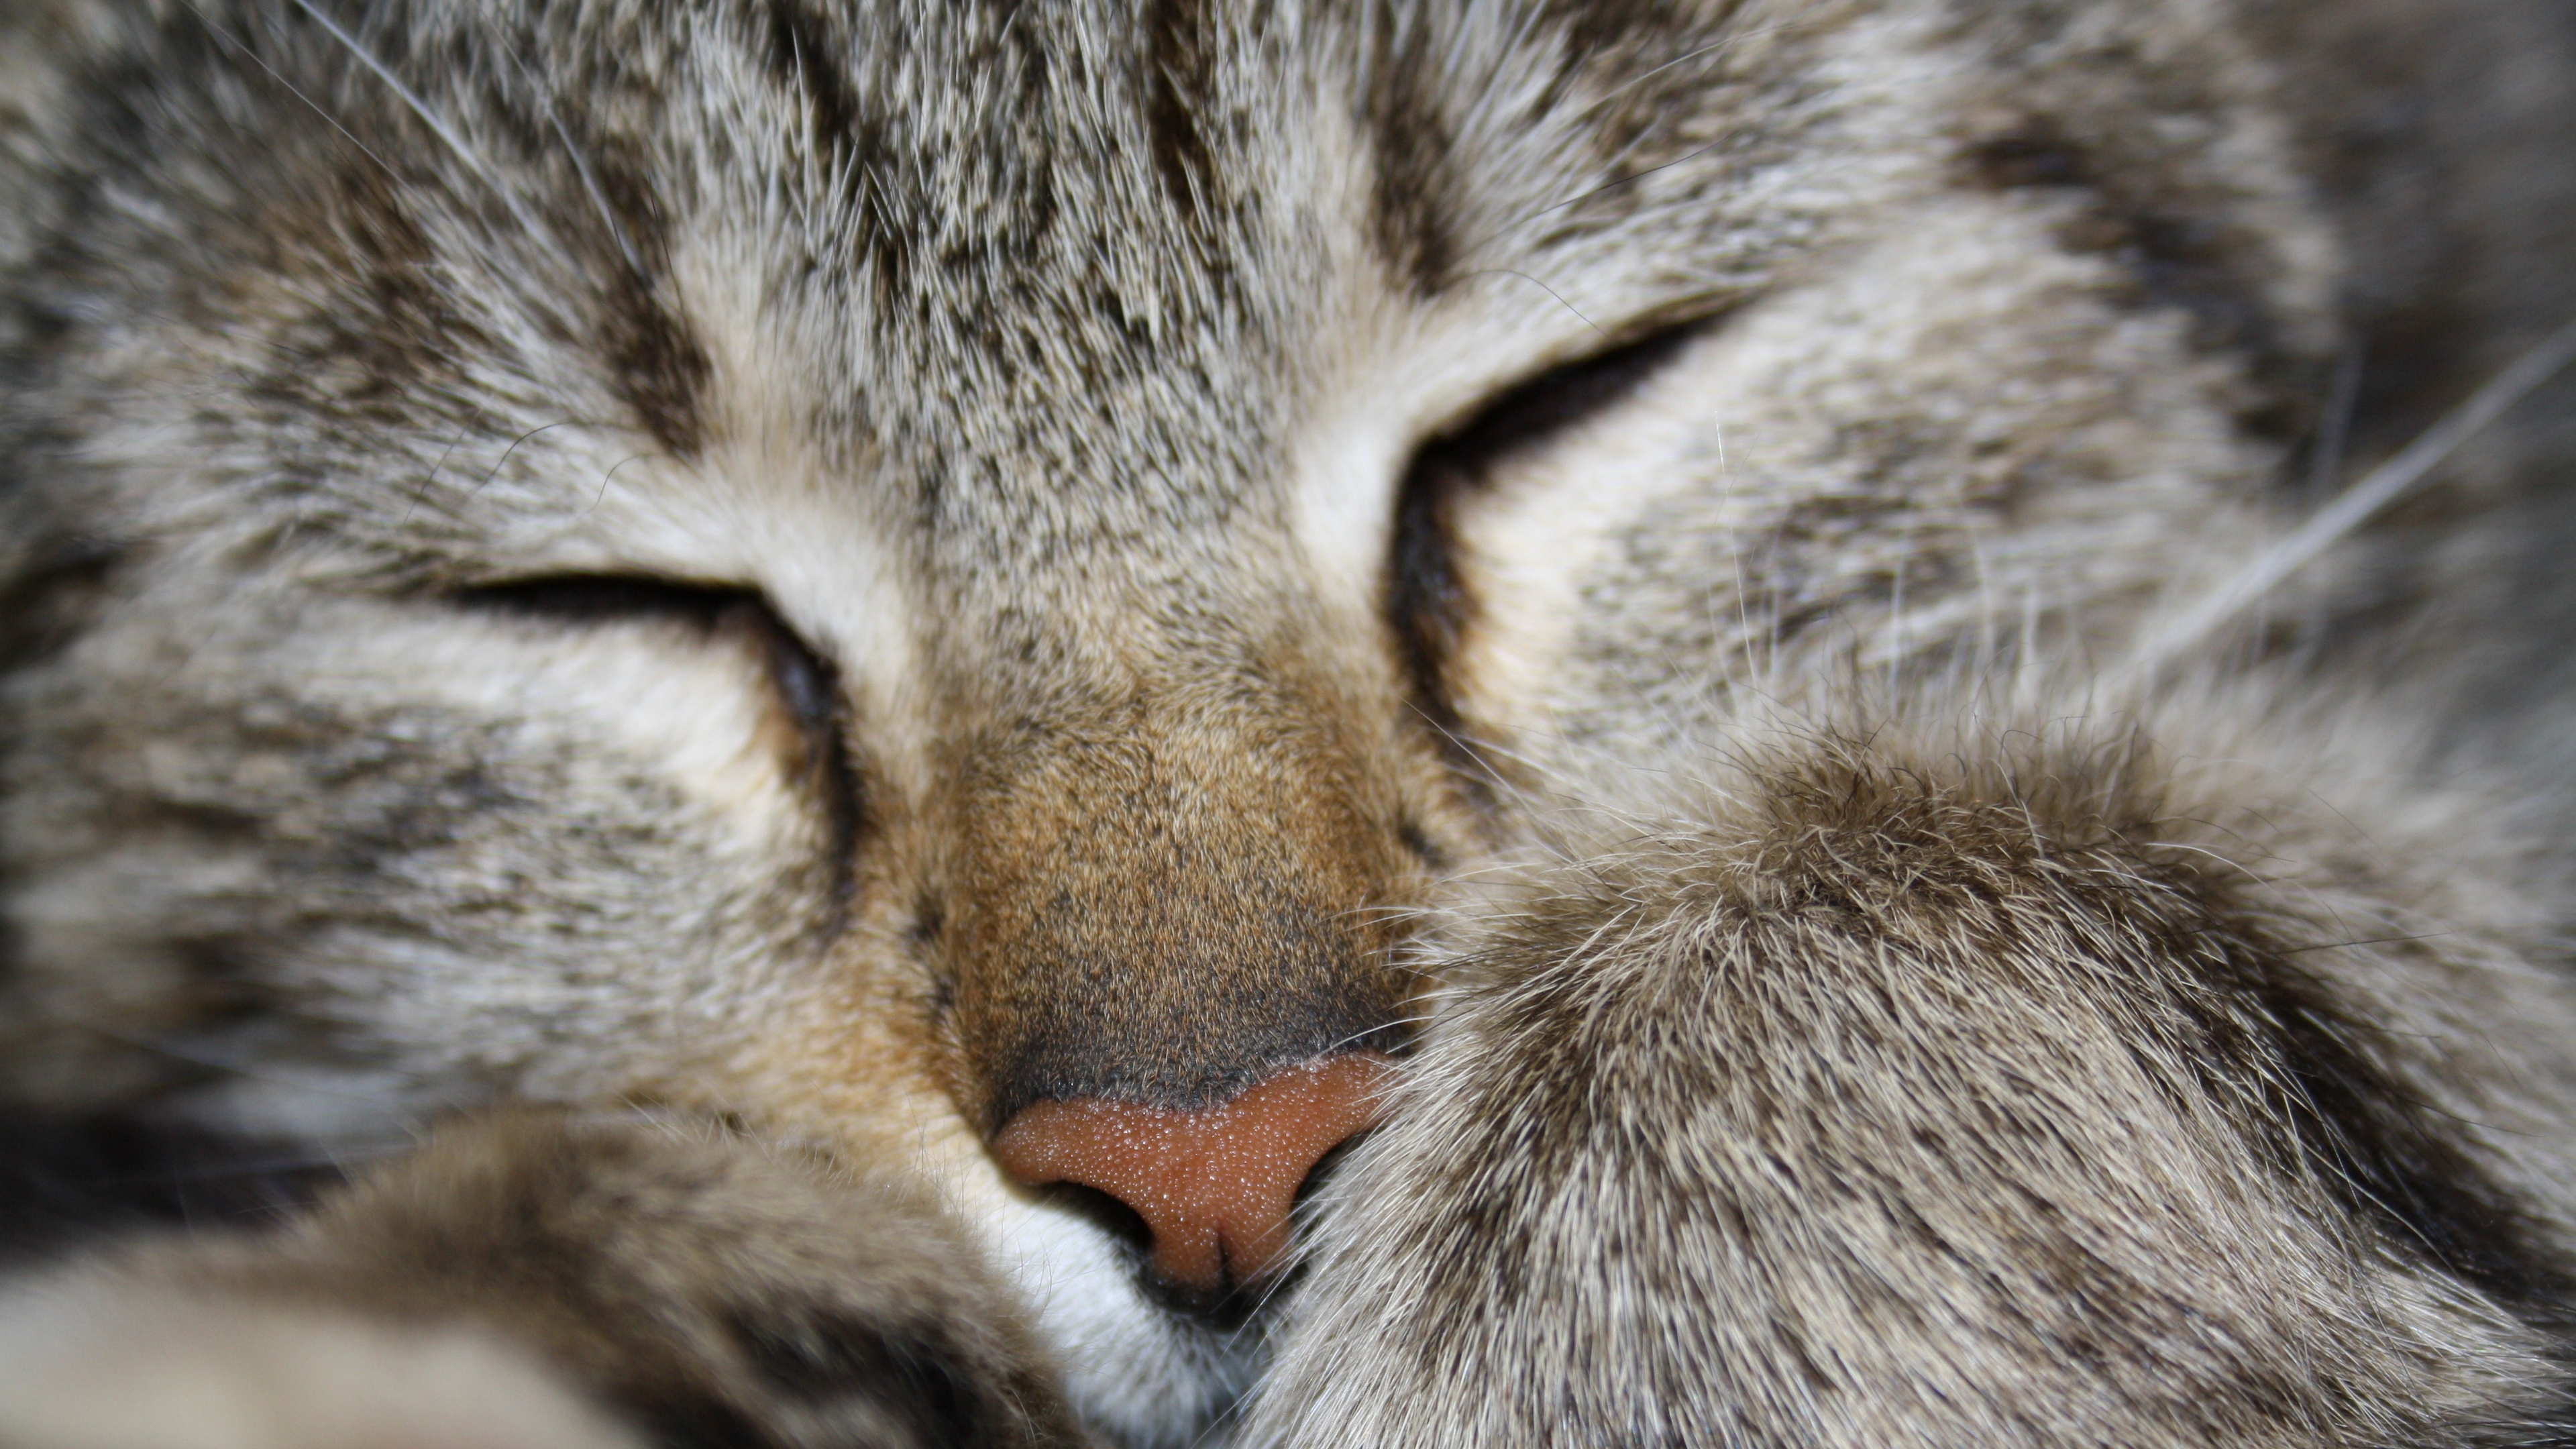 cat paw striped face 4k 1542241690 - cat, paw, striped, face 4k - striped, paw, Cat